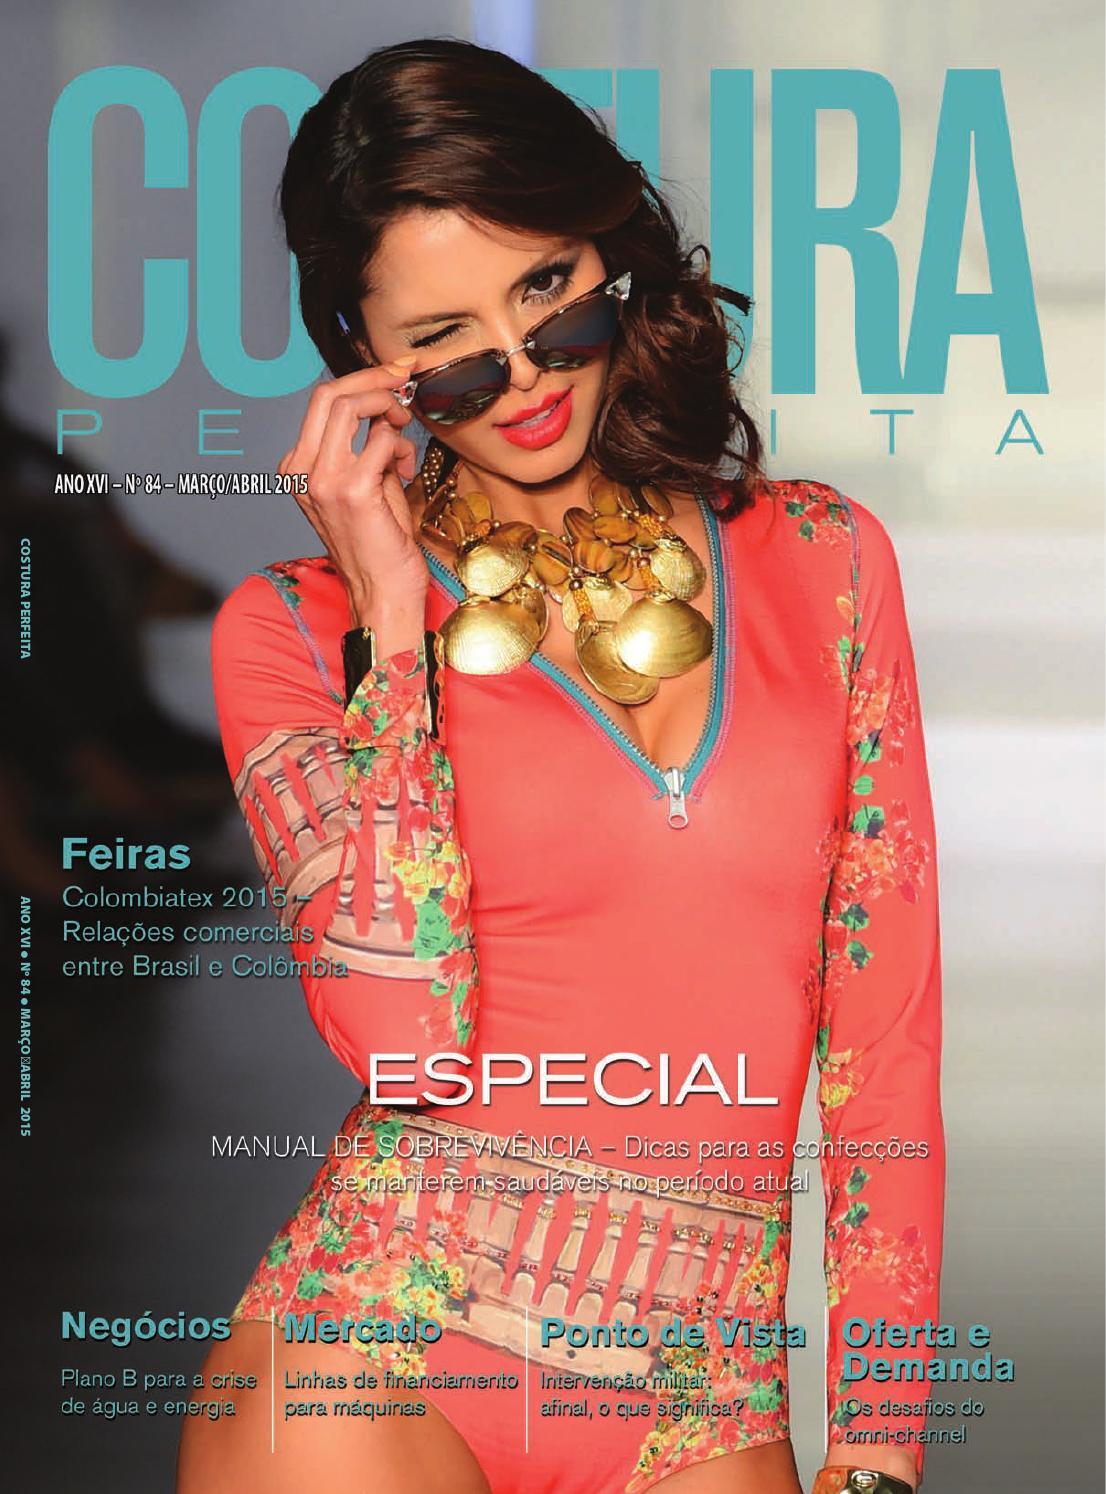 Revista Costura Perfeita Ano XVI n°84 Marco Abril 2015 by Costura Perfeita  - issuu cdd91a306f